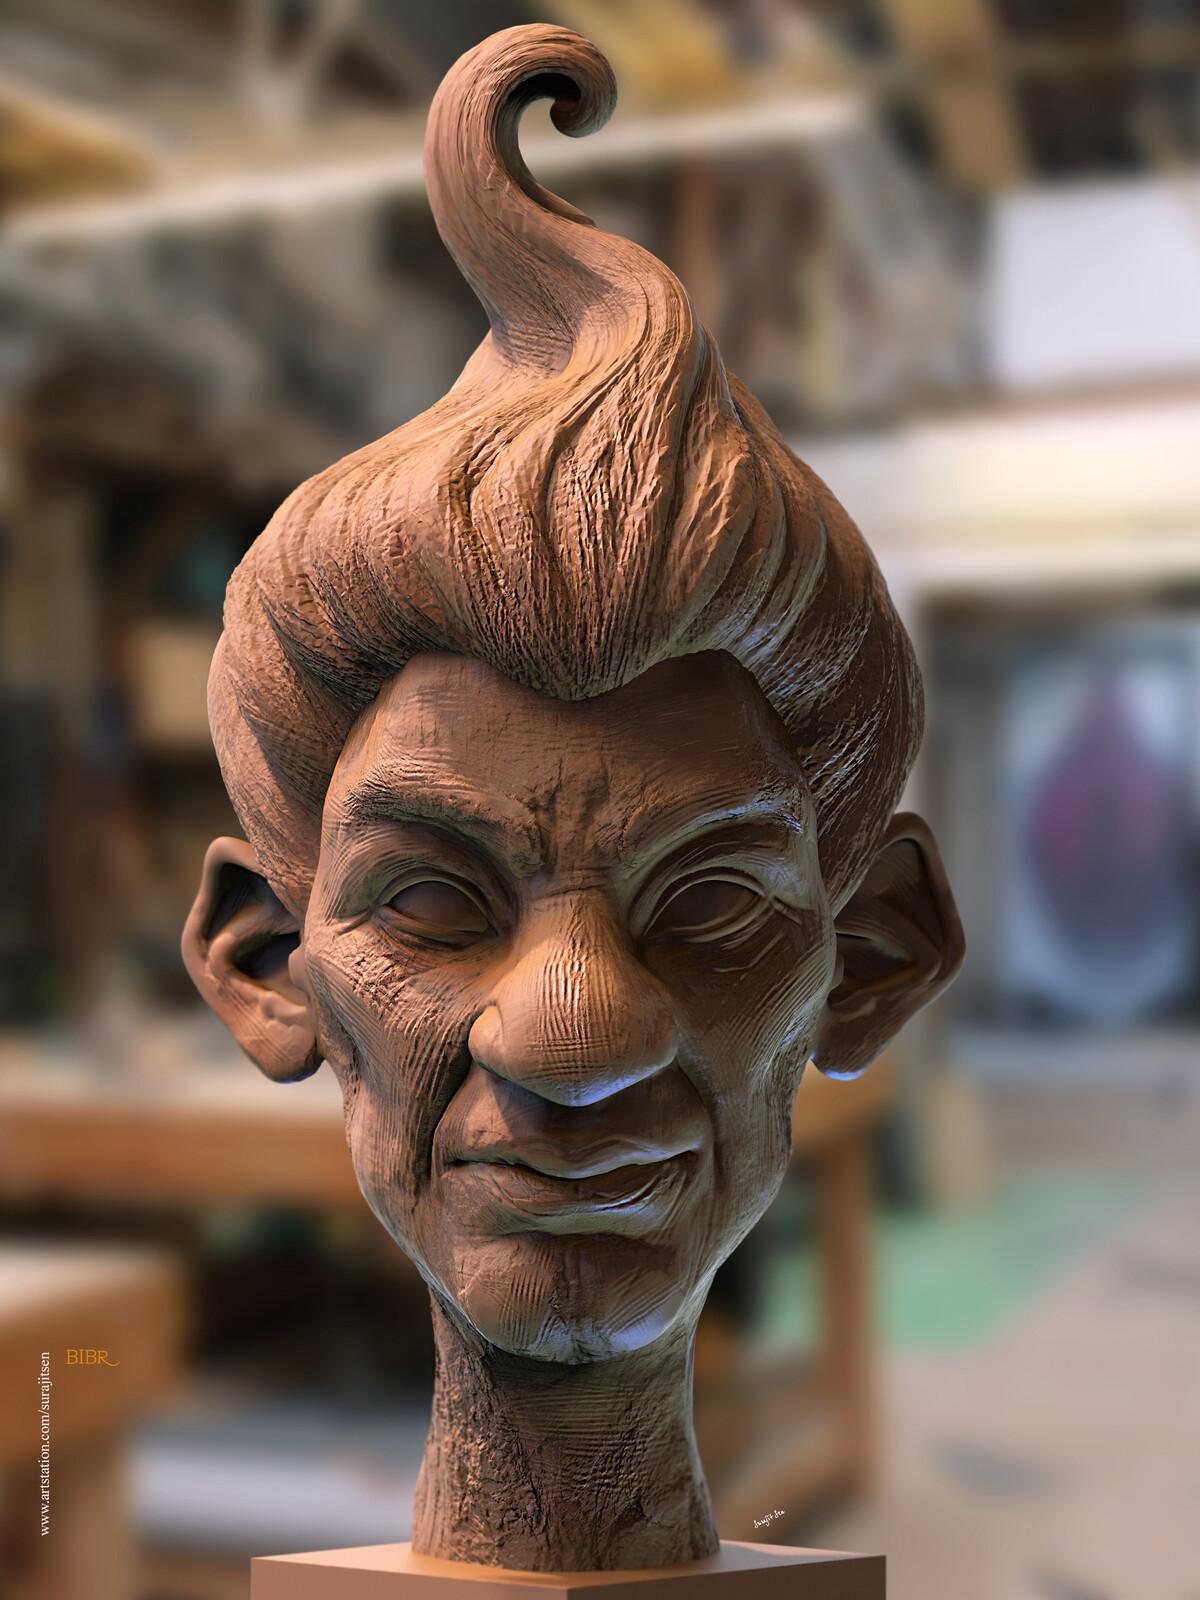 #doodle Speed Digital Sculpting study works... Bibr Background music- #hanszimmermusic